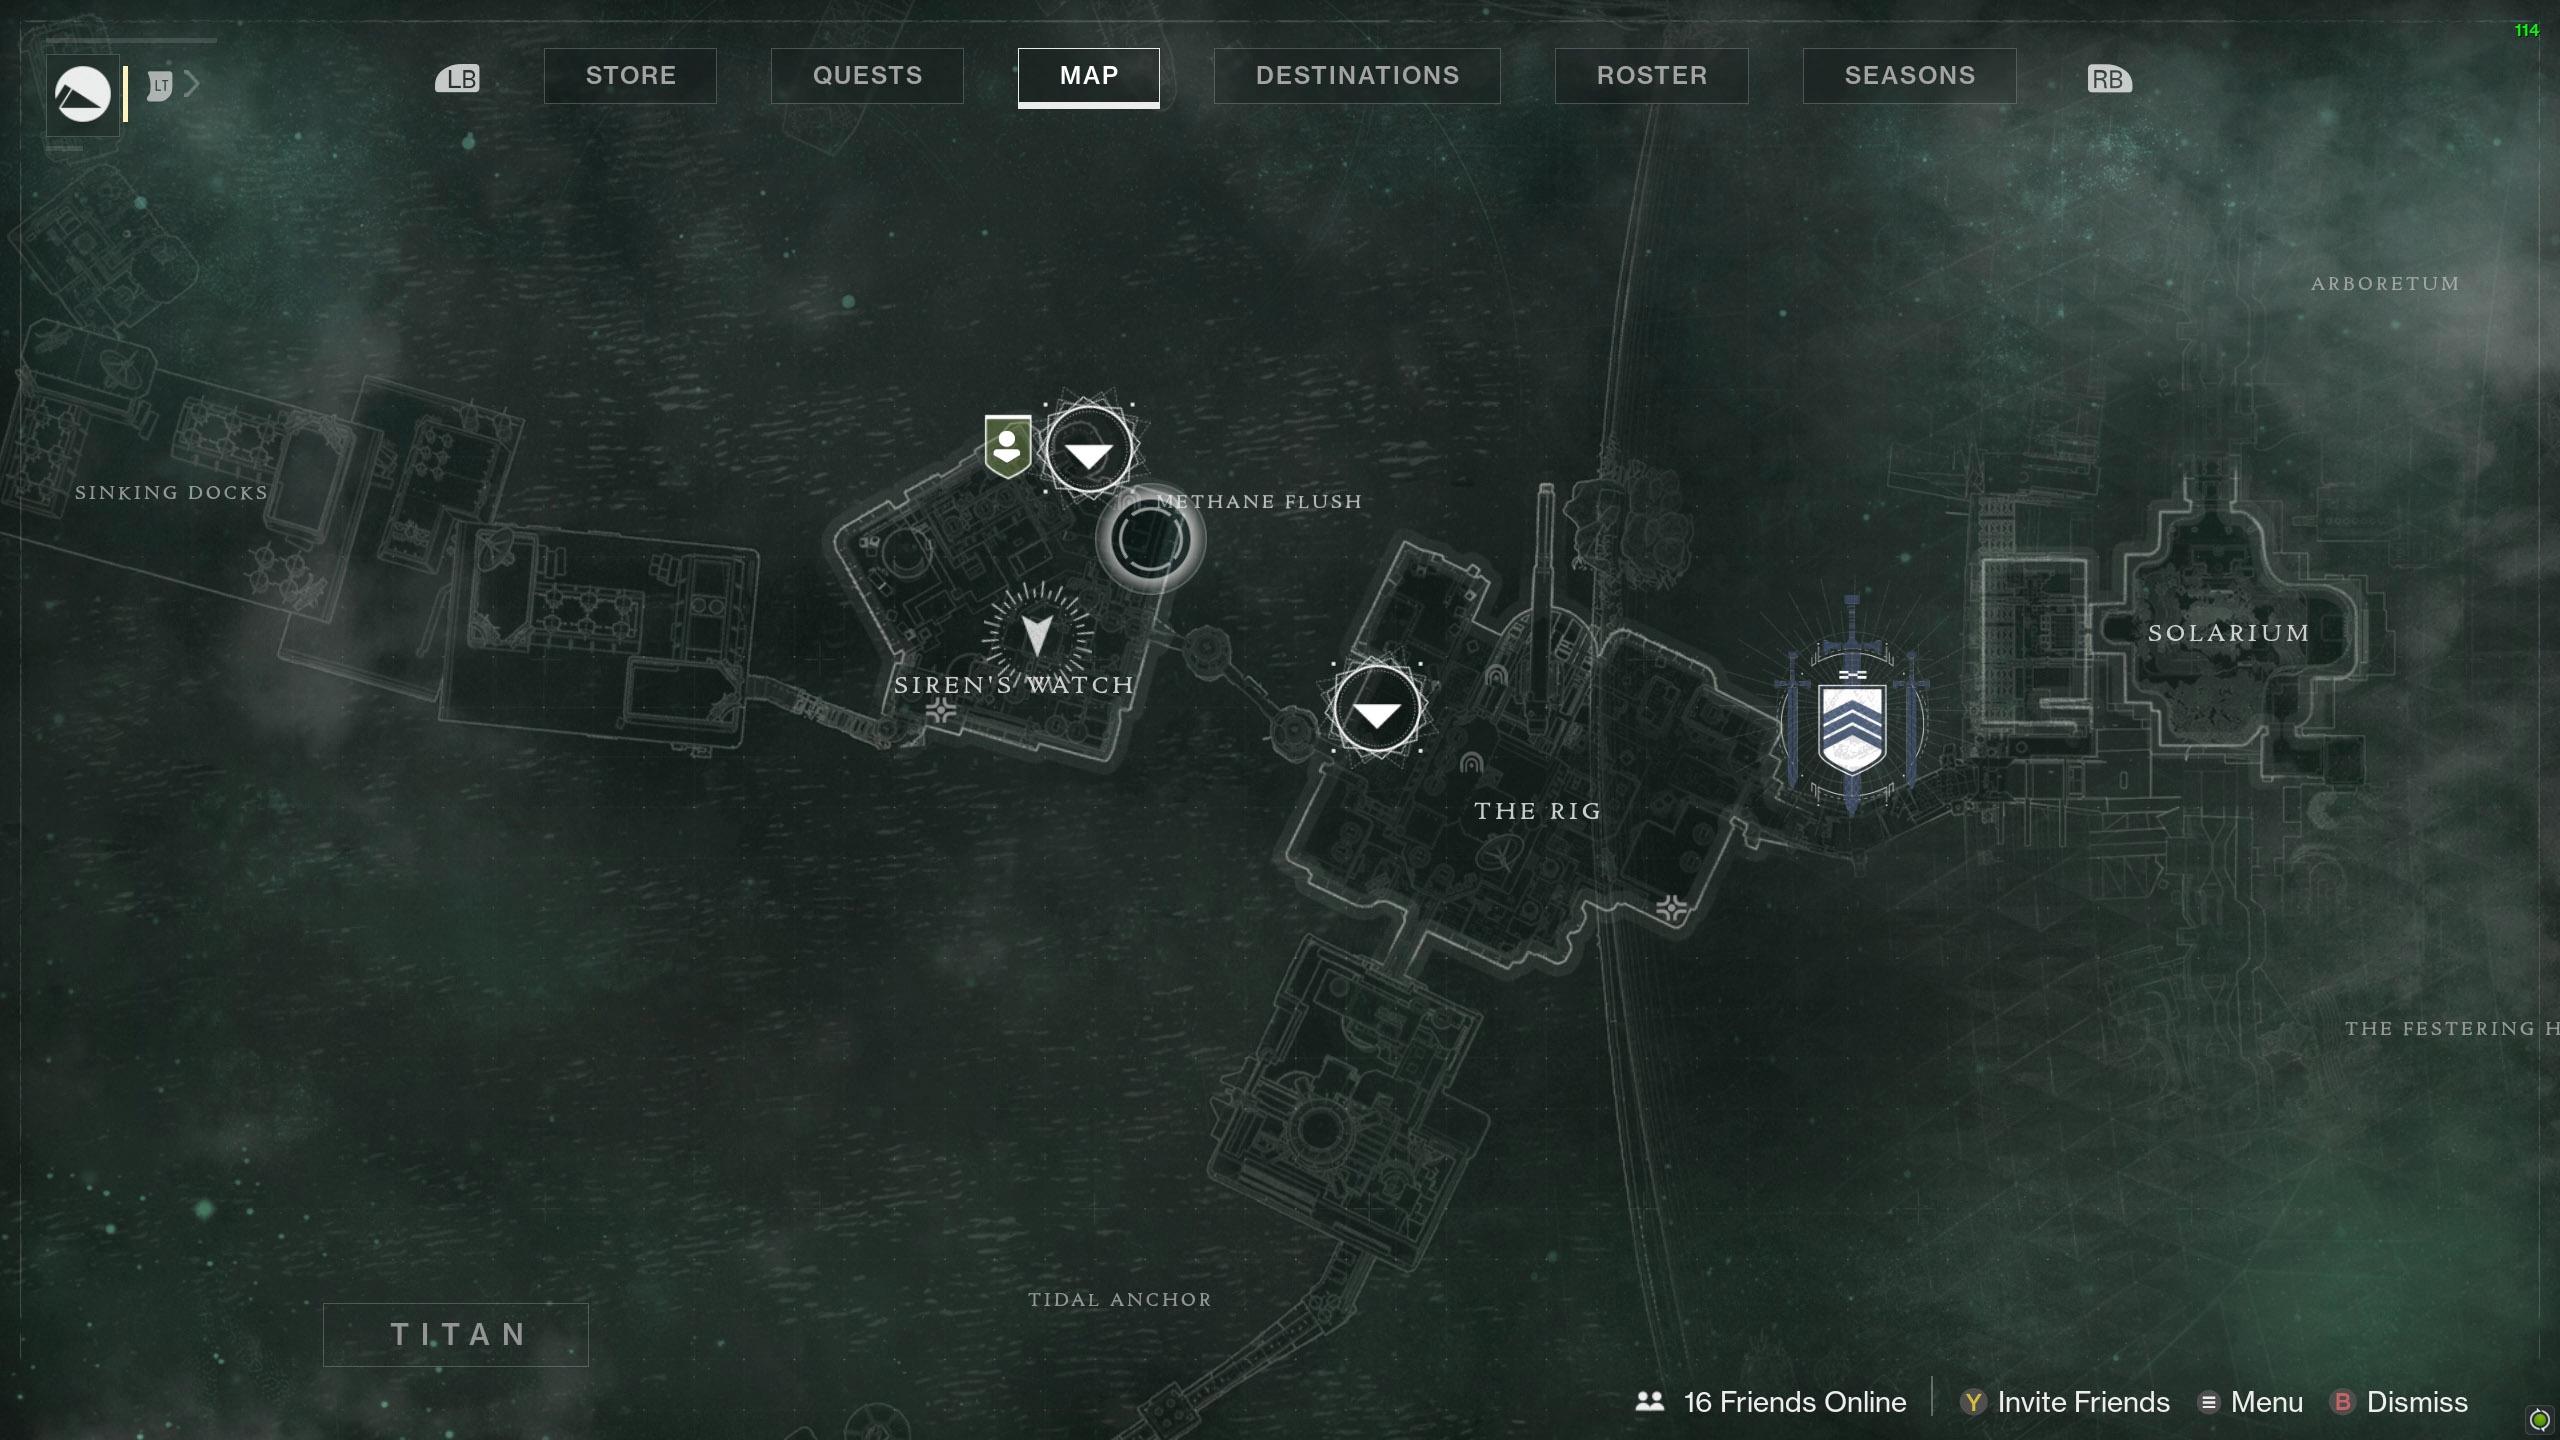 Destiny 2 Savanthuns Eyes Titan Methane Flush map